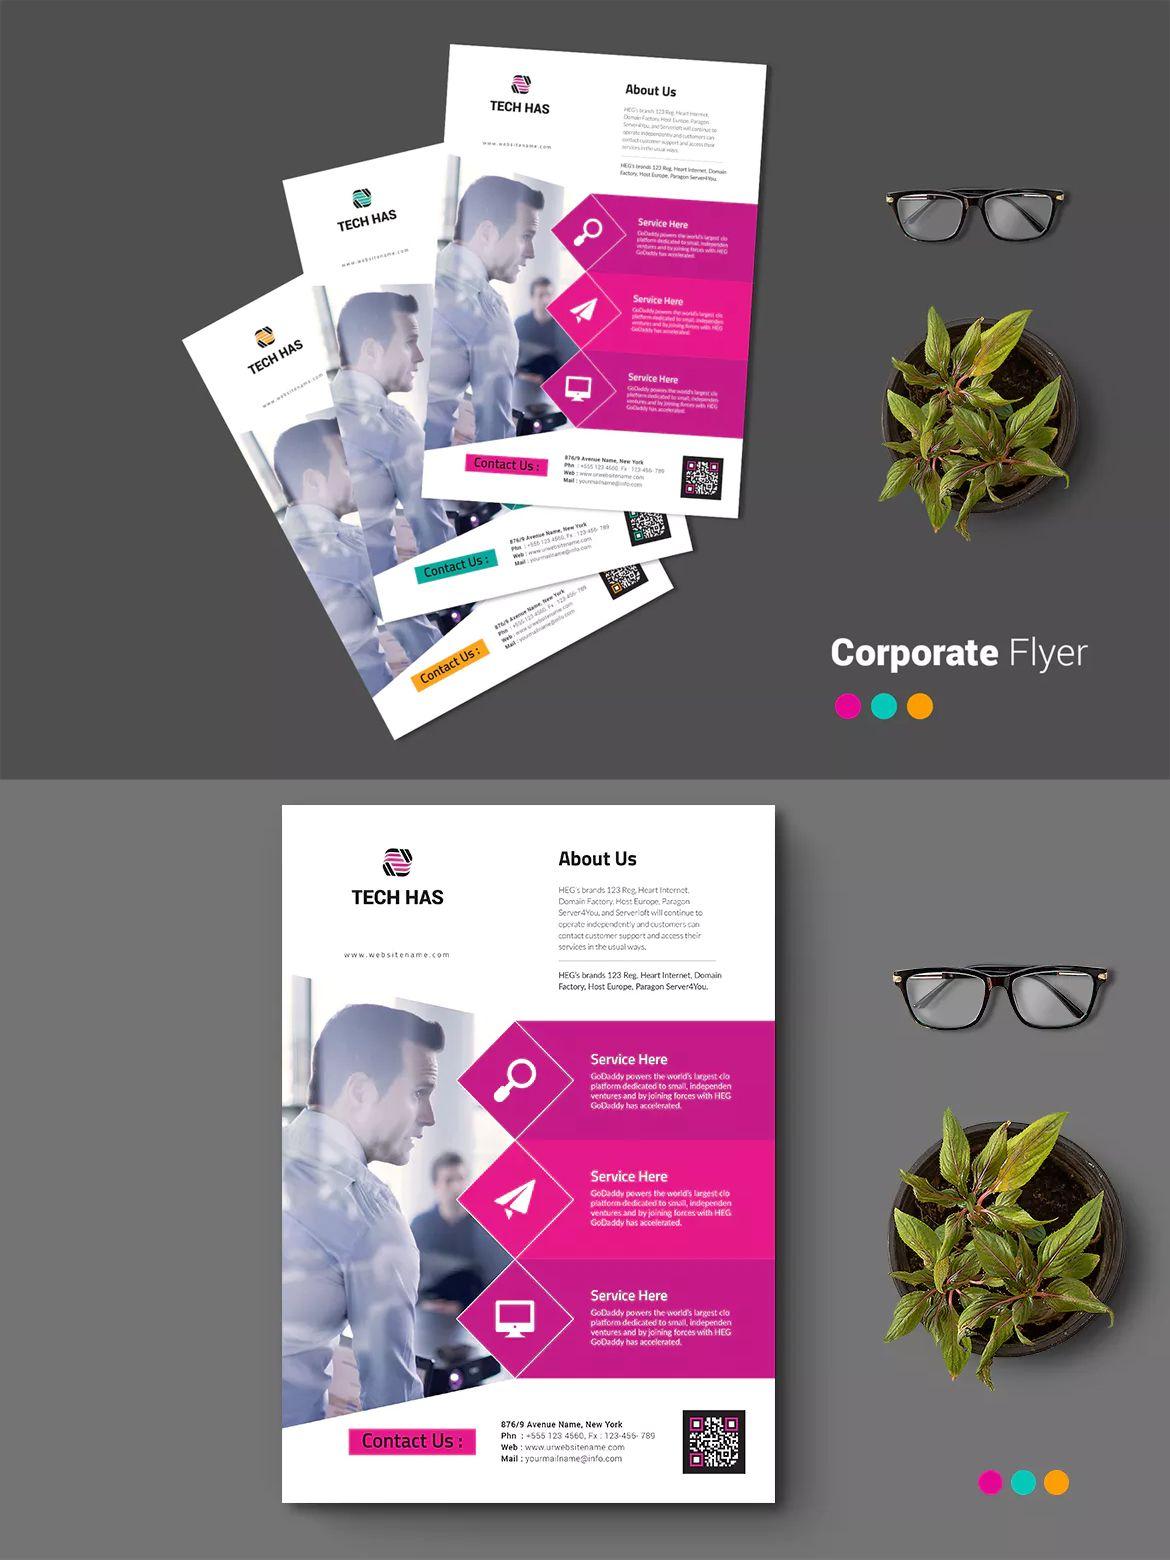 Flyer Samples Templates New Flyer Template Ai Eps A4  Flyer Design Templates  Pinterest .